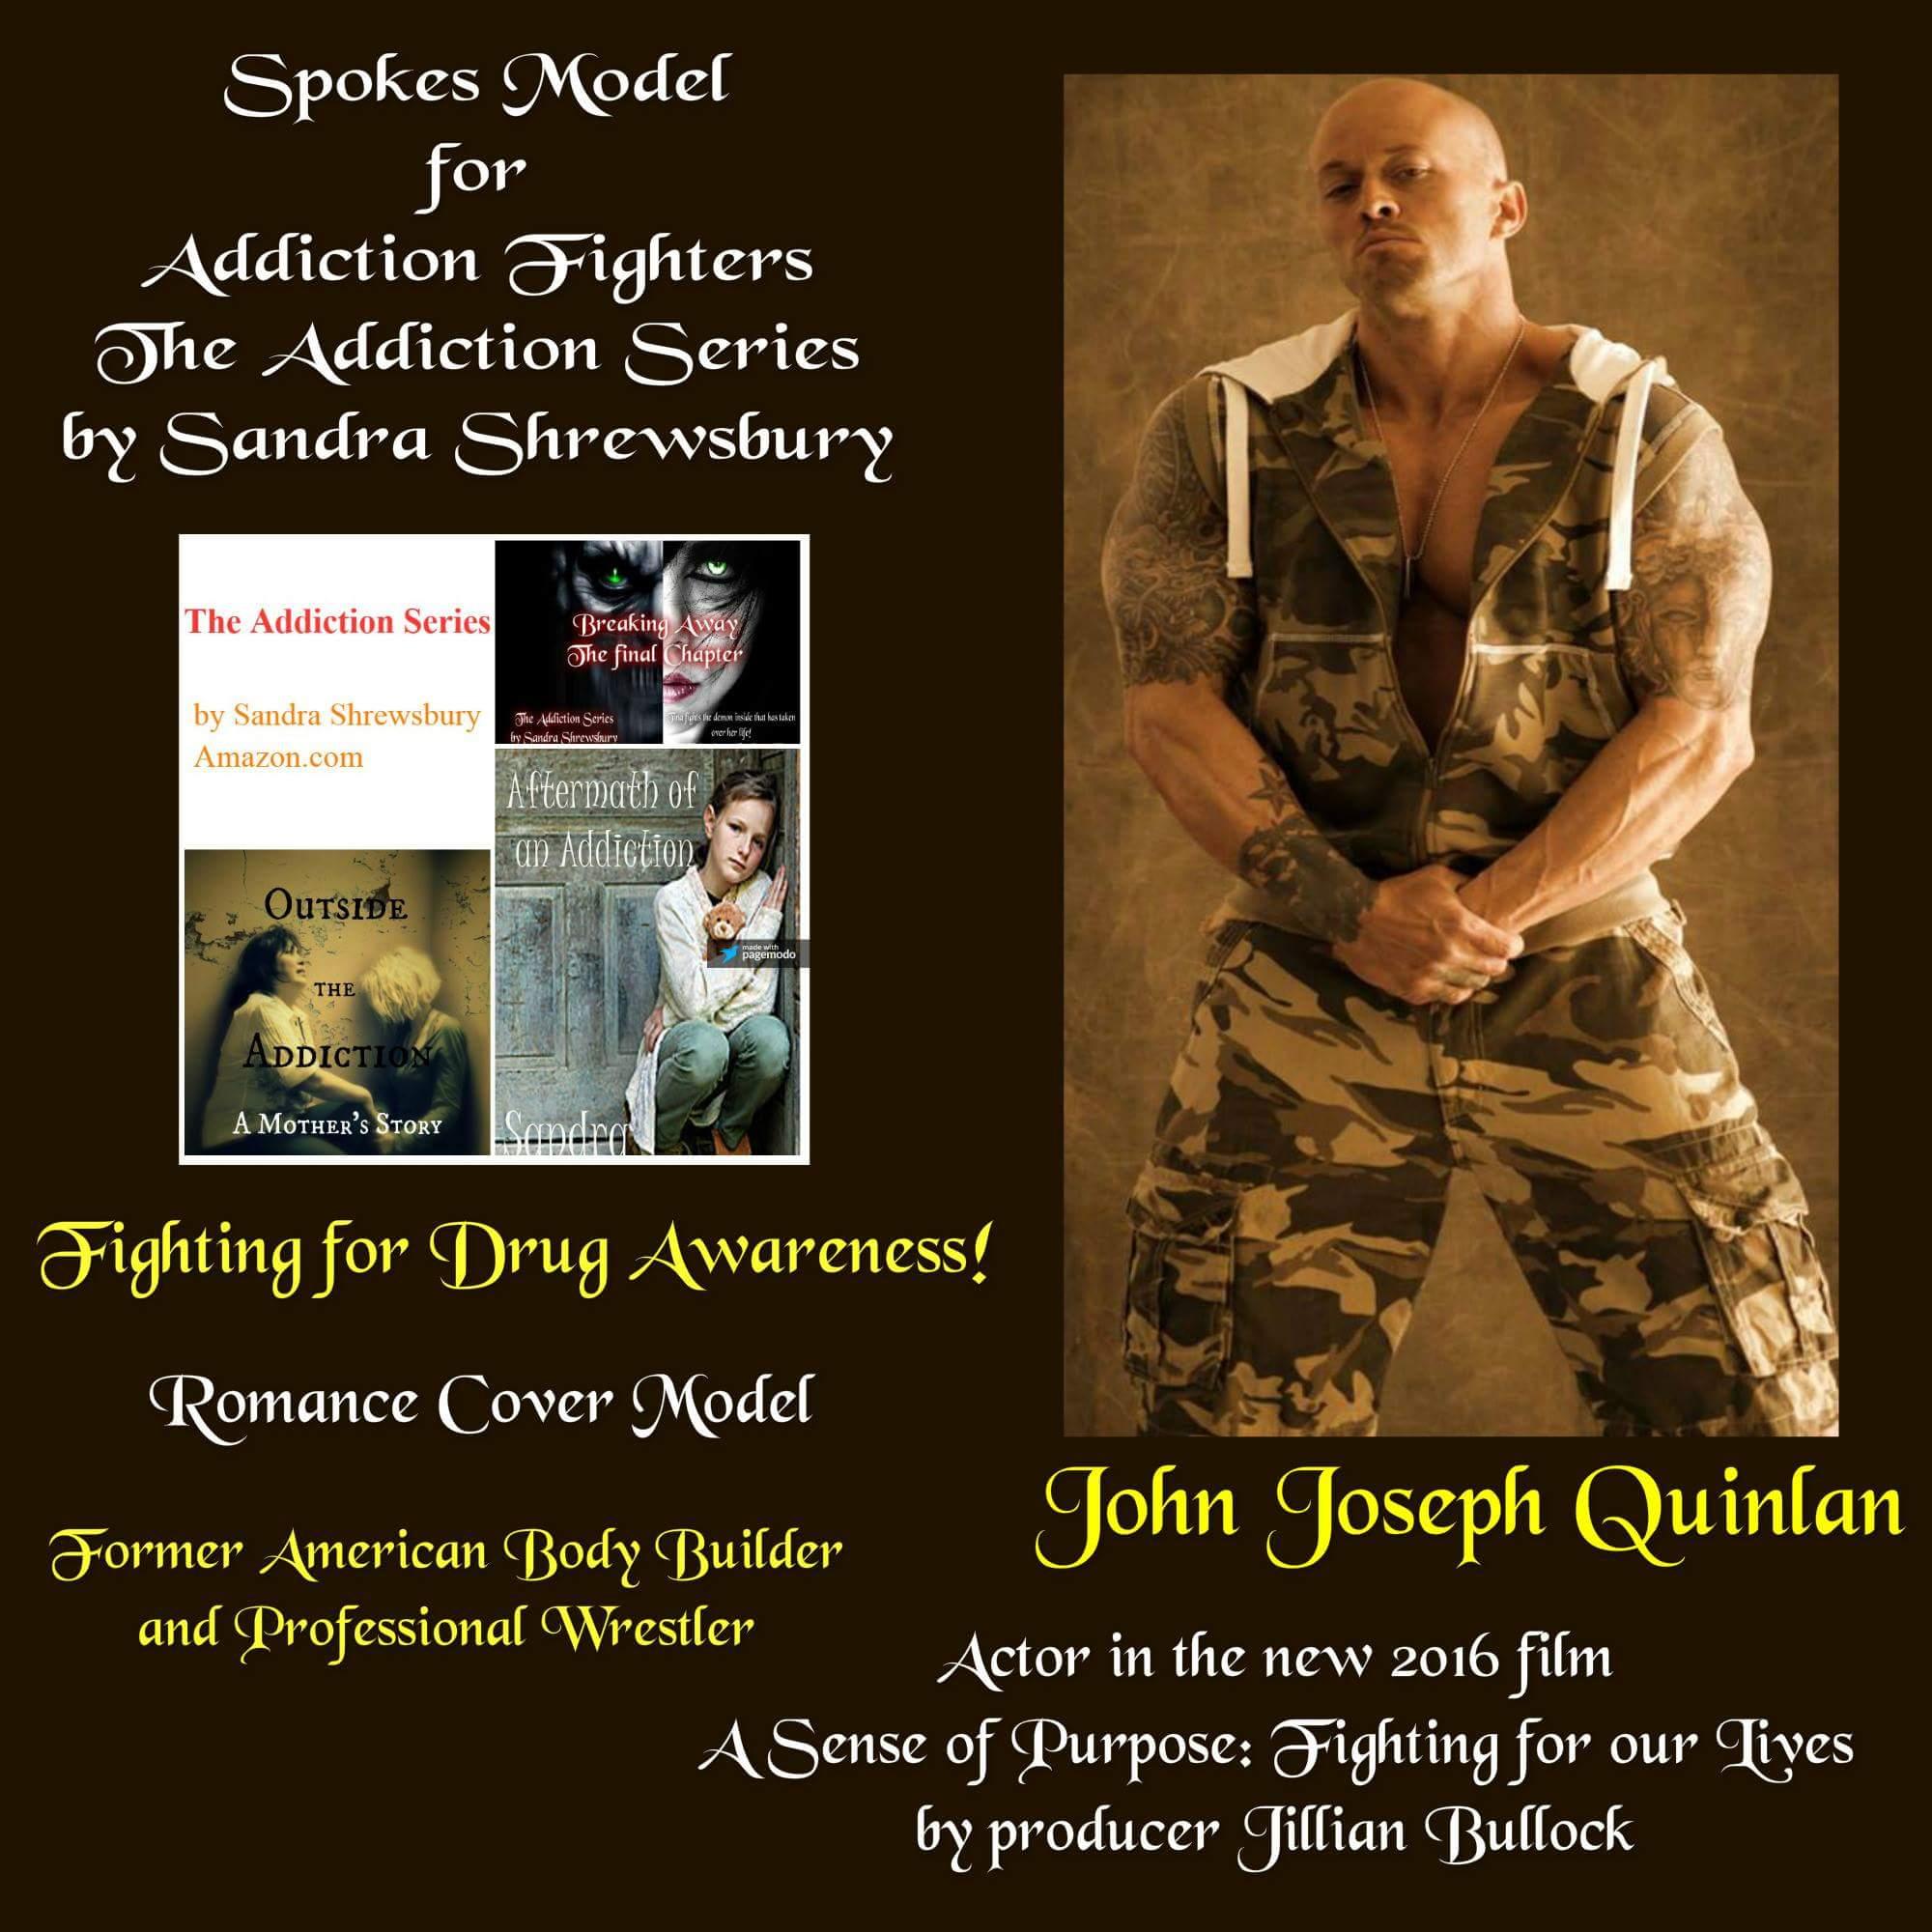 Addiction Series Celebrity Spokes Model John Joseph Quinlan Drugs Awareness Poster by Sandra Shrewsbury 2016 #JohnQuinlan